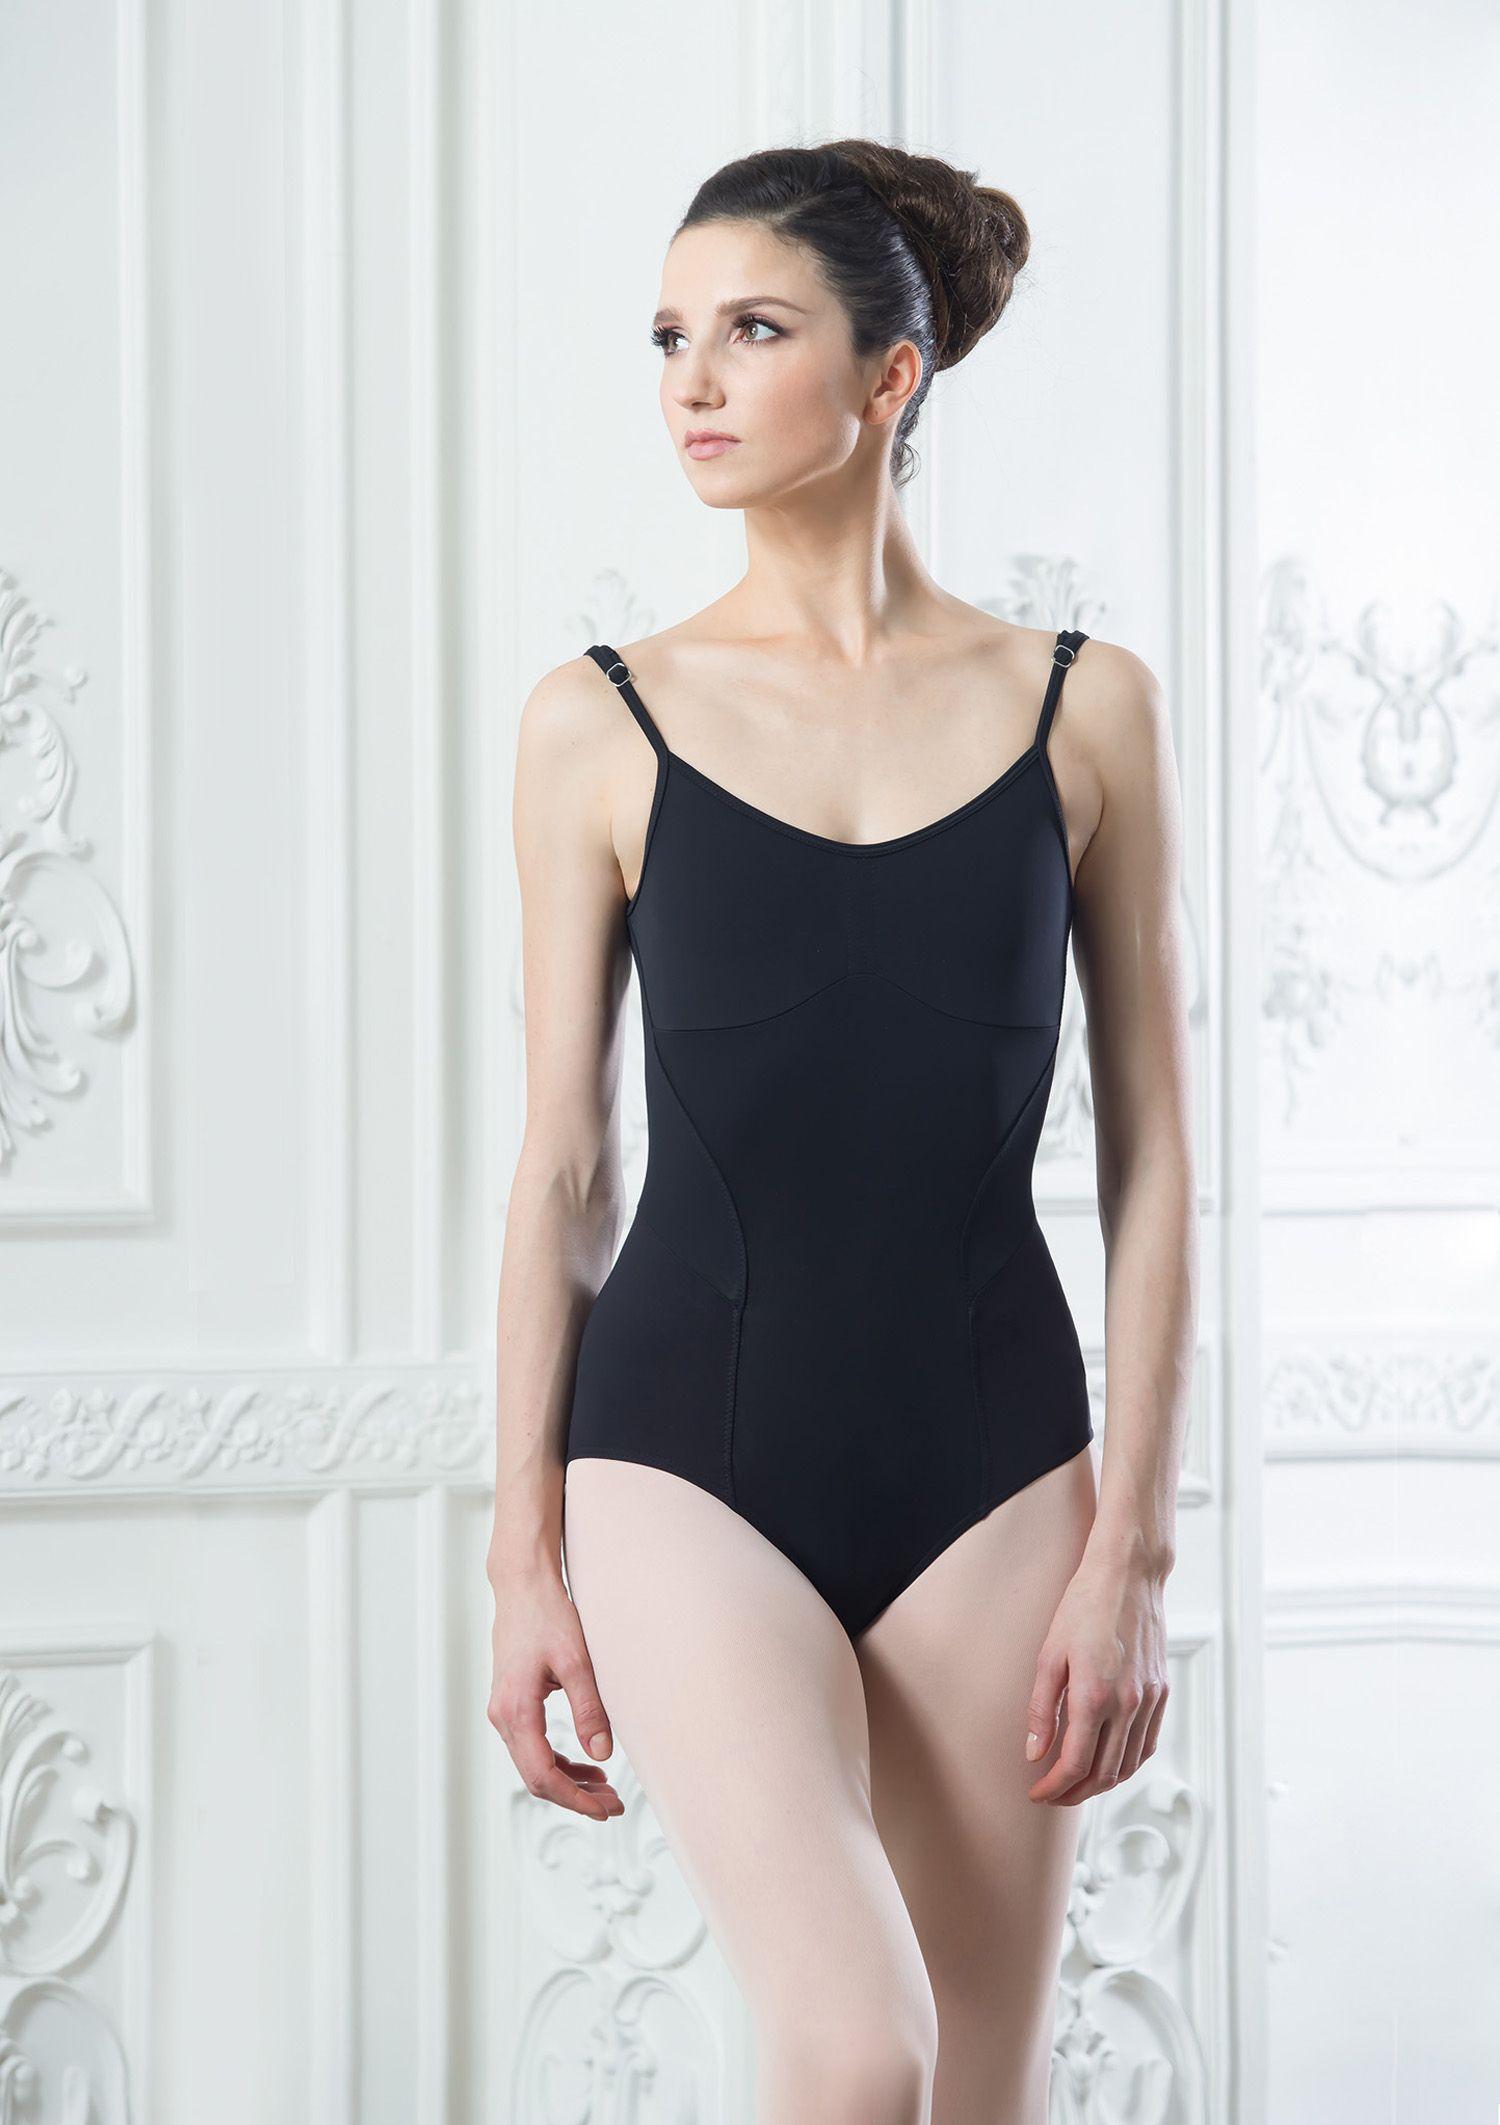 Lace bodysuit high neck  Smart leotard with removable pushup cups  ballet  Pinterest  Dancing